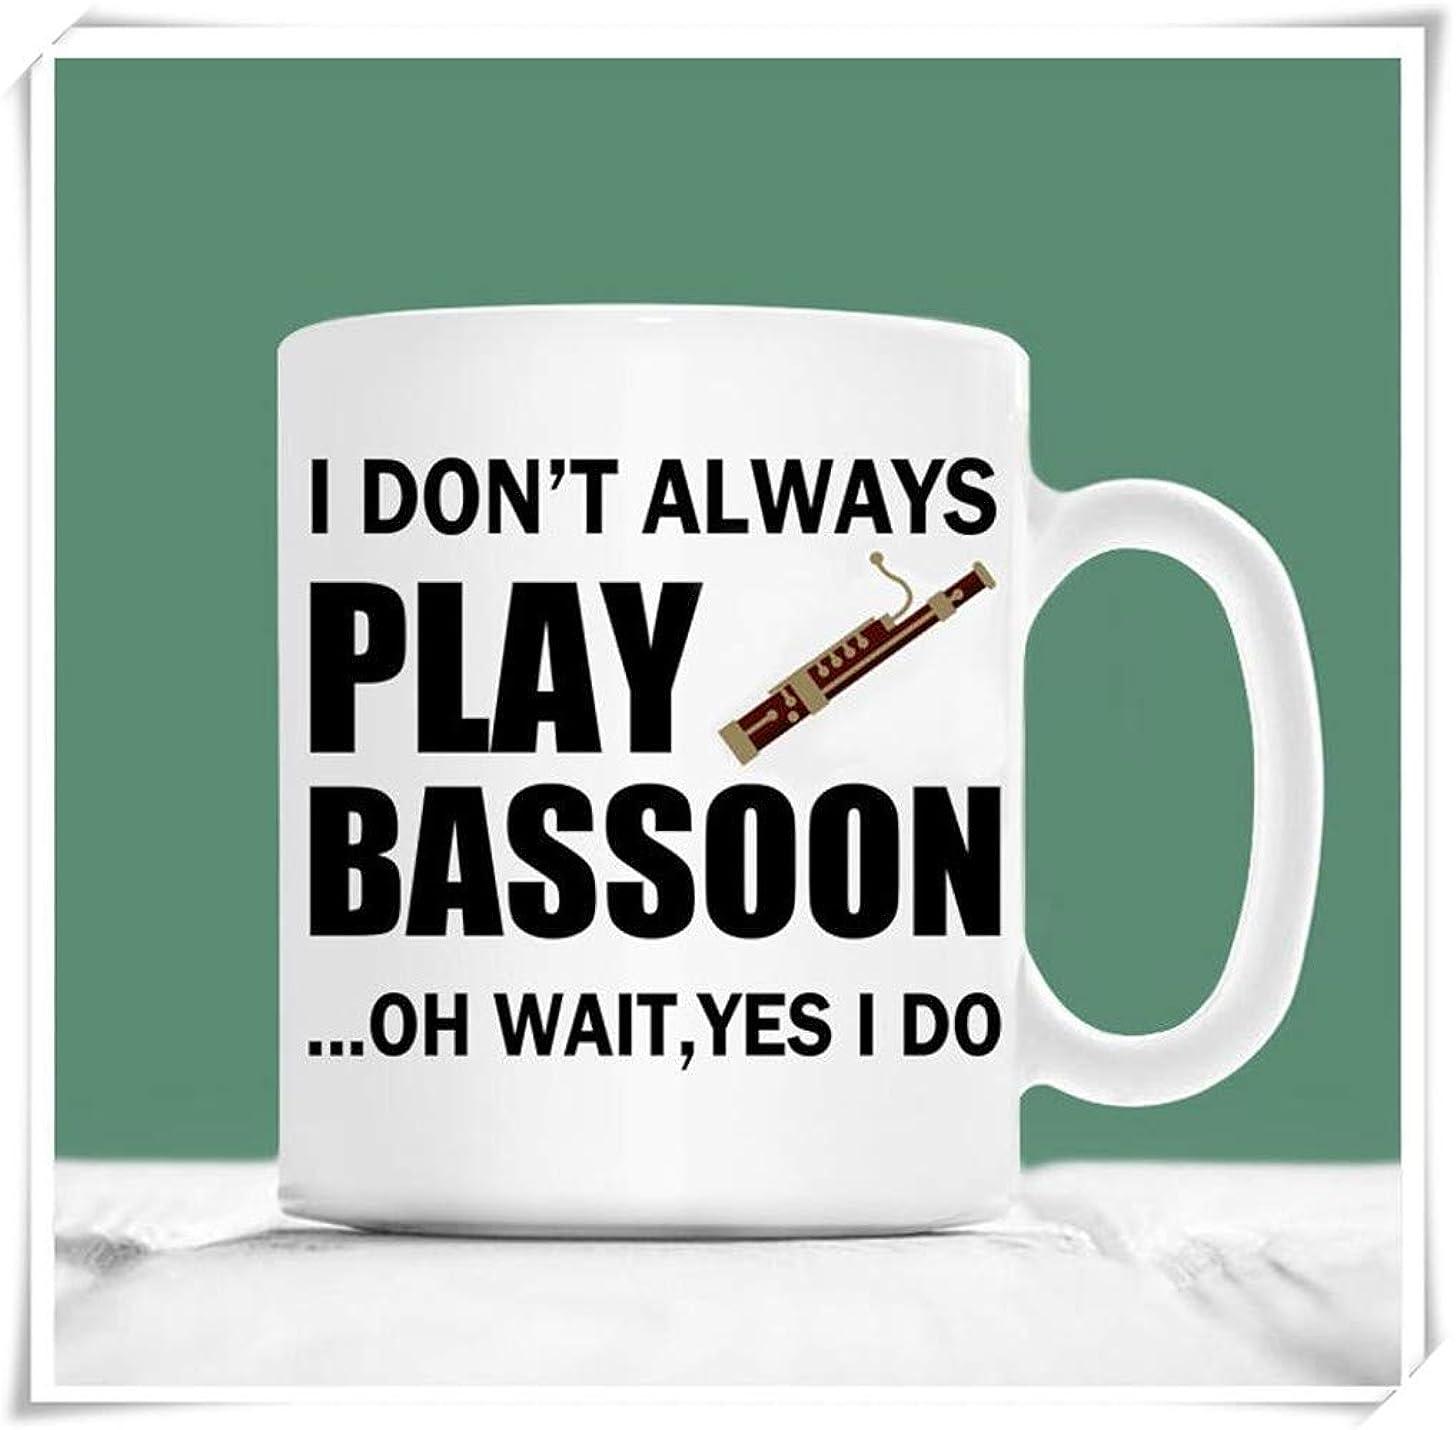 Mr.Fixed - Bassoon Mug, I Don't Always Play Bassoon Oh Wait Yes I Do, Gift For Bassoon Player, Bassoon Tea Cup, 11oz Ceramic Coffee Mug, Unique Gift